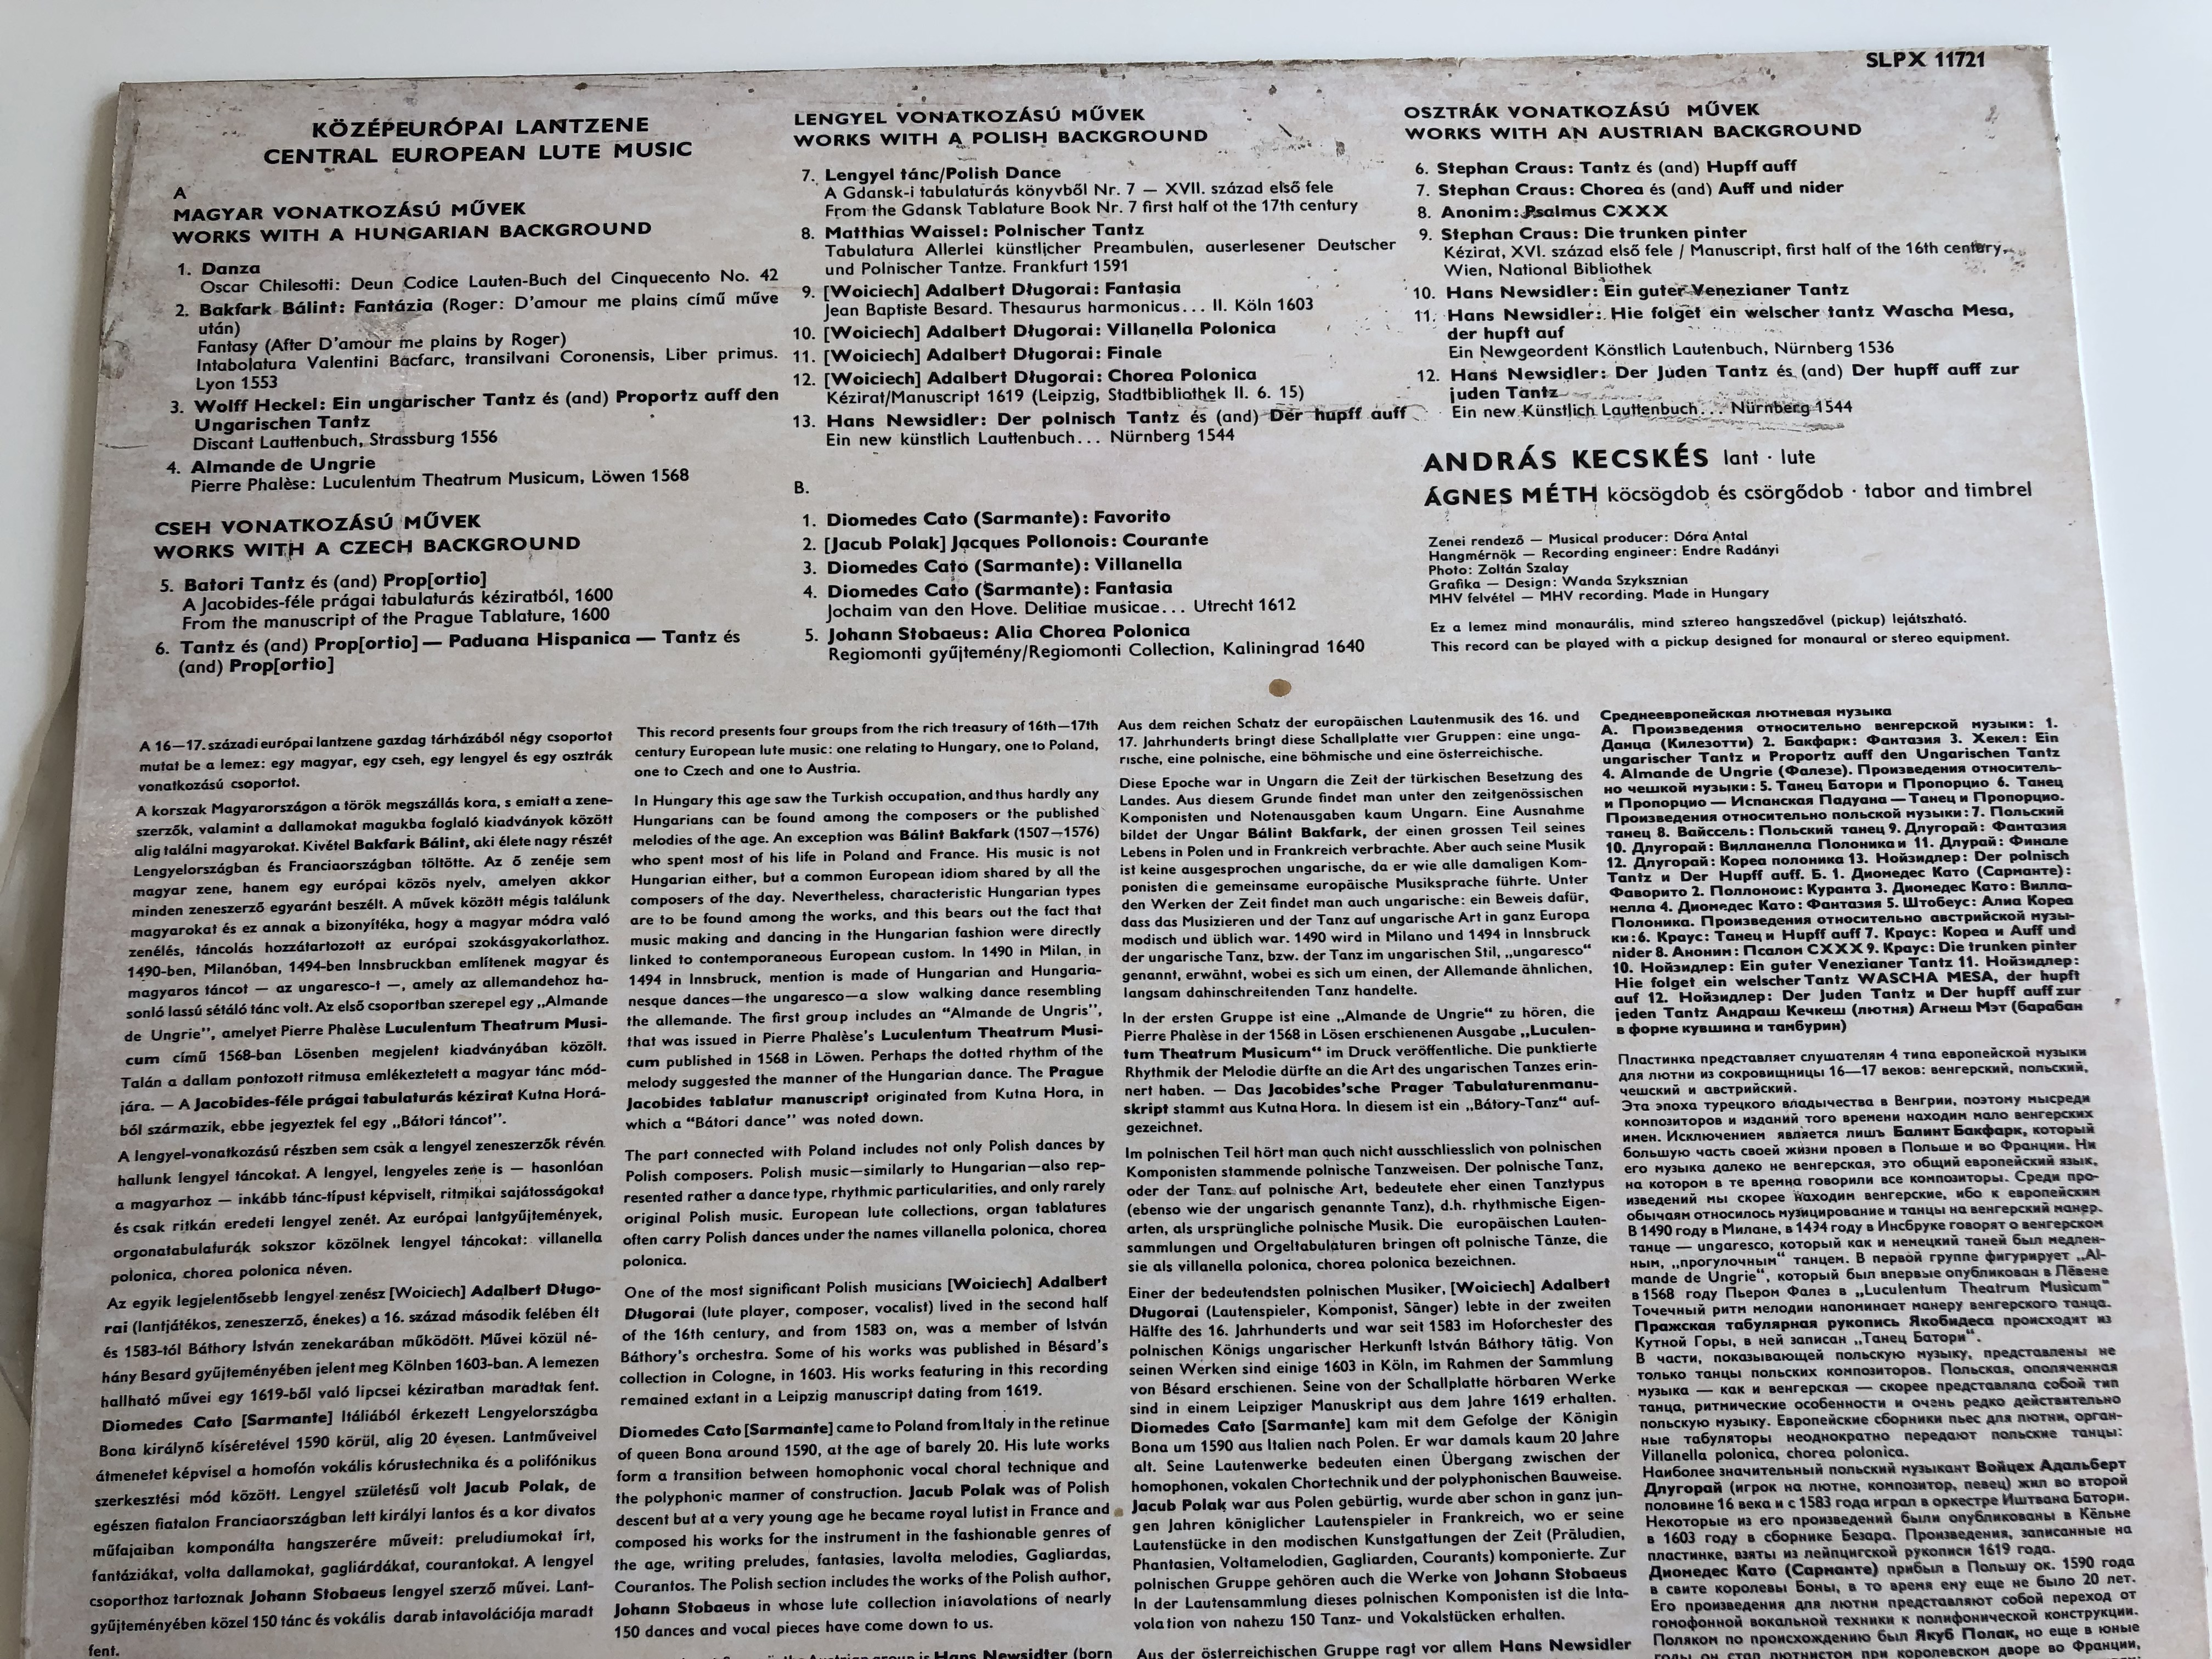 central-european-lute-music-16th-17th-century-andr-s-kecsk-s-hungaroton-lp-stereo-mono-slpx-11721-3-.jpg